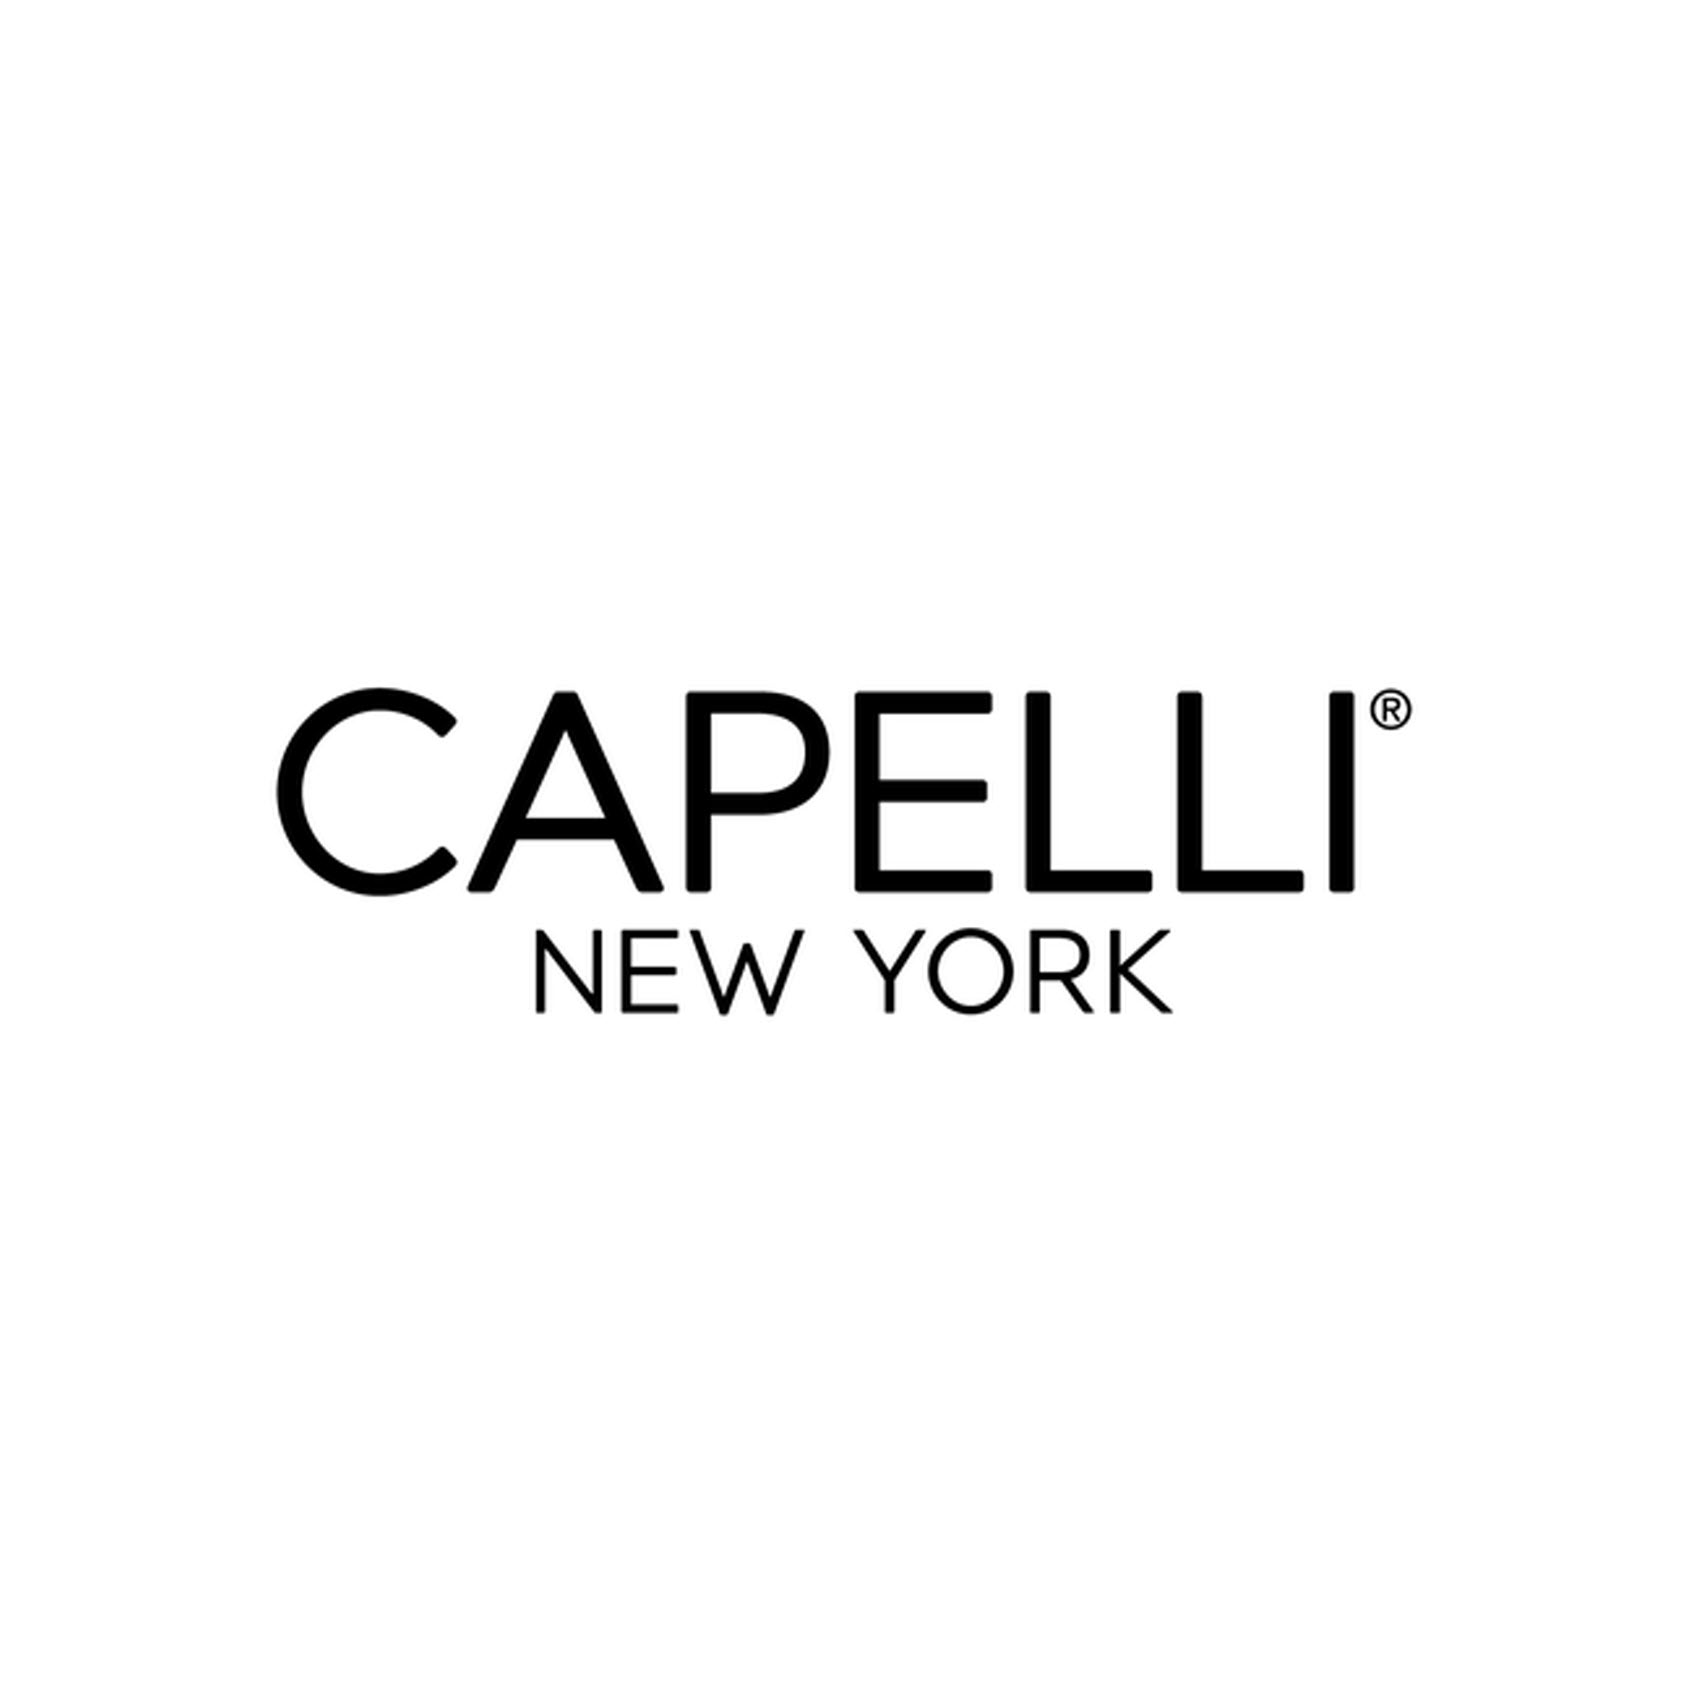 Capelli Logo.jpg